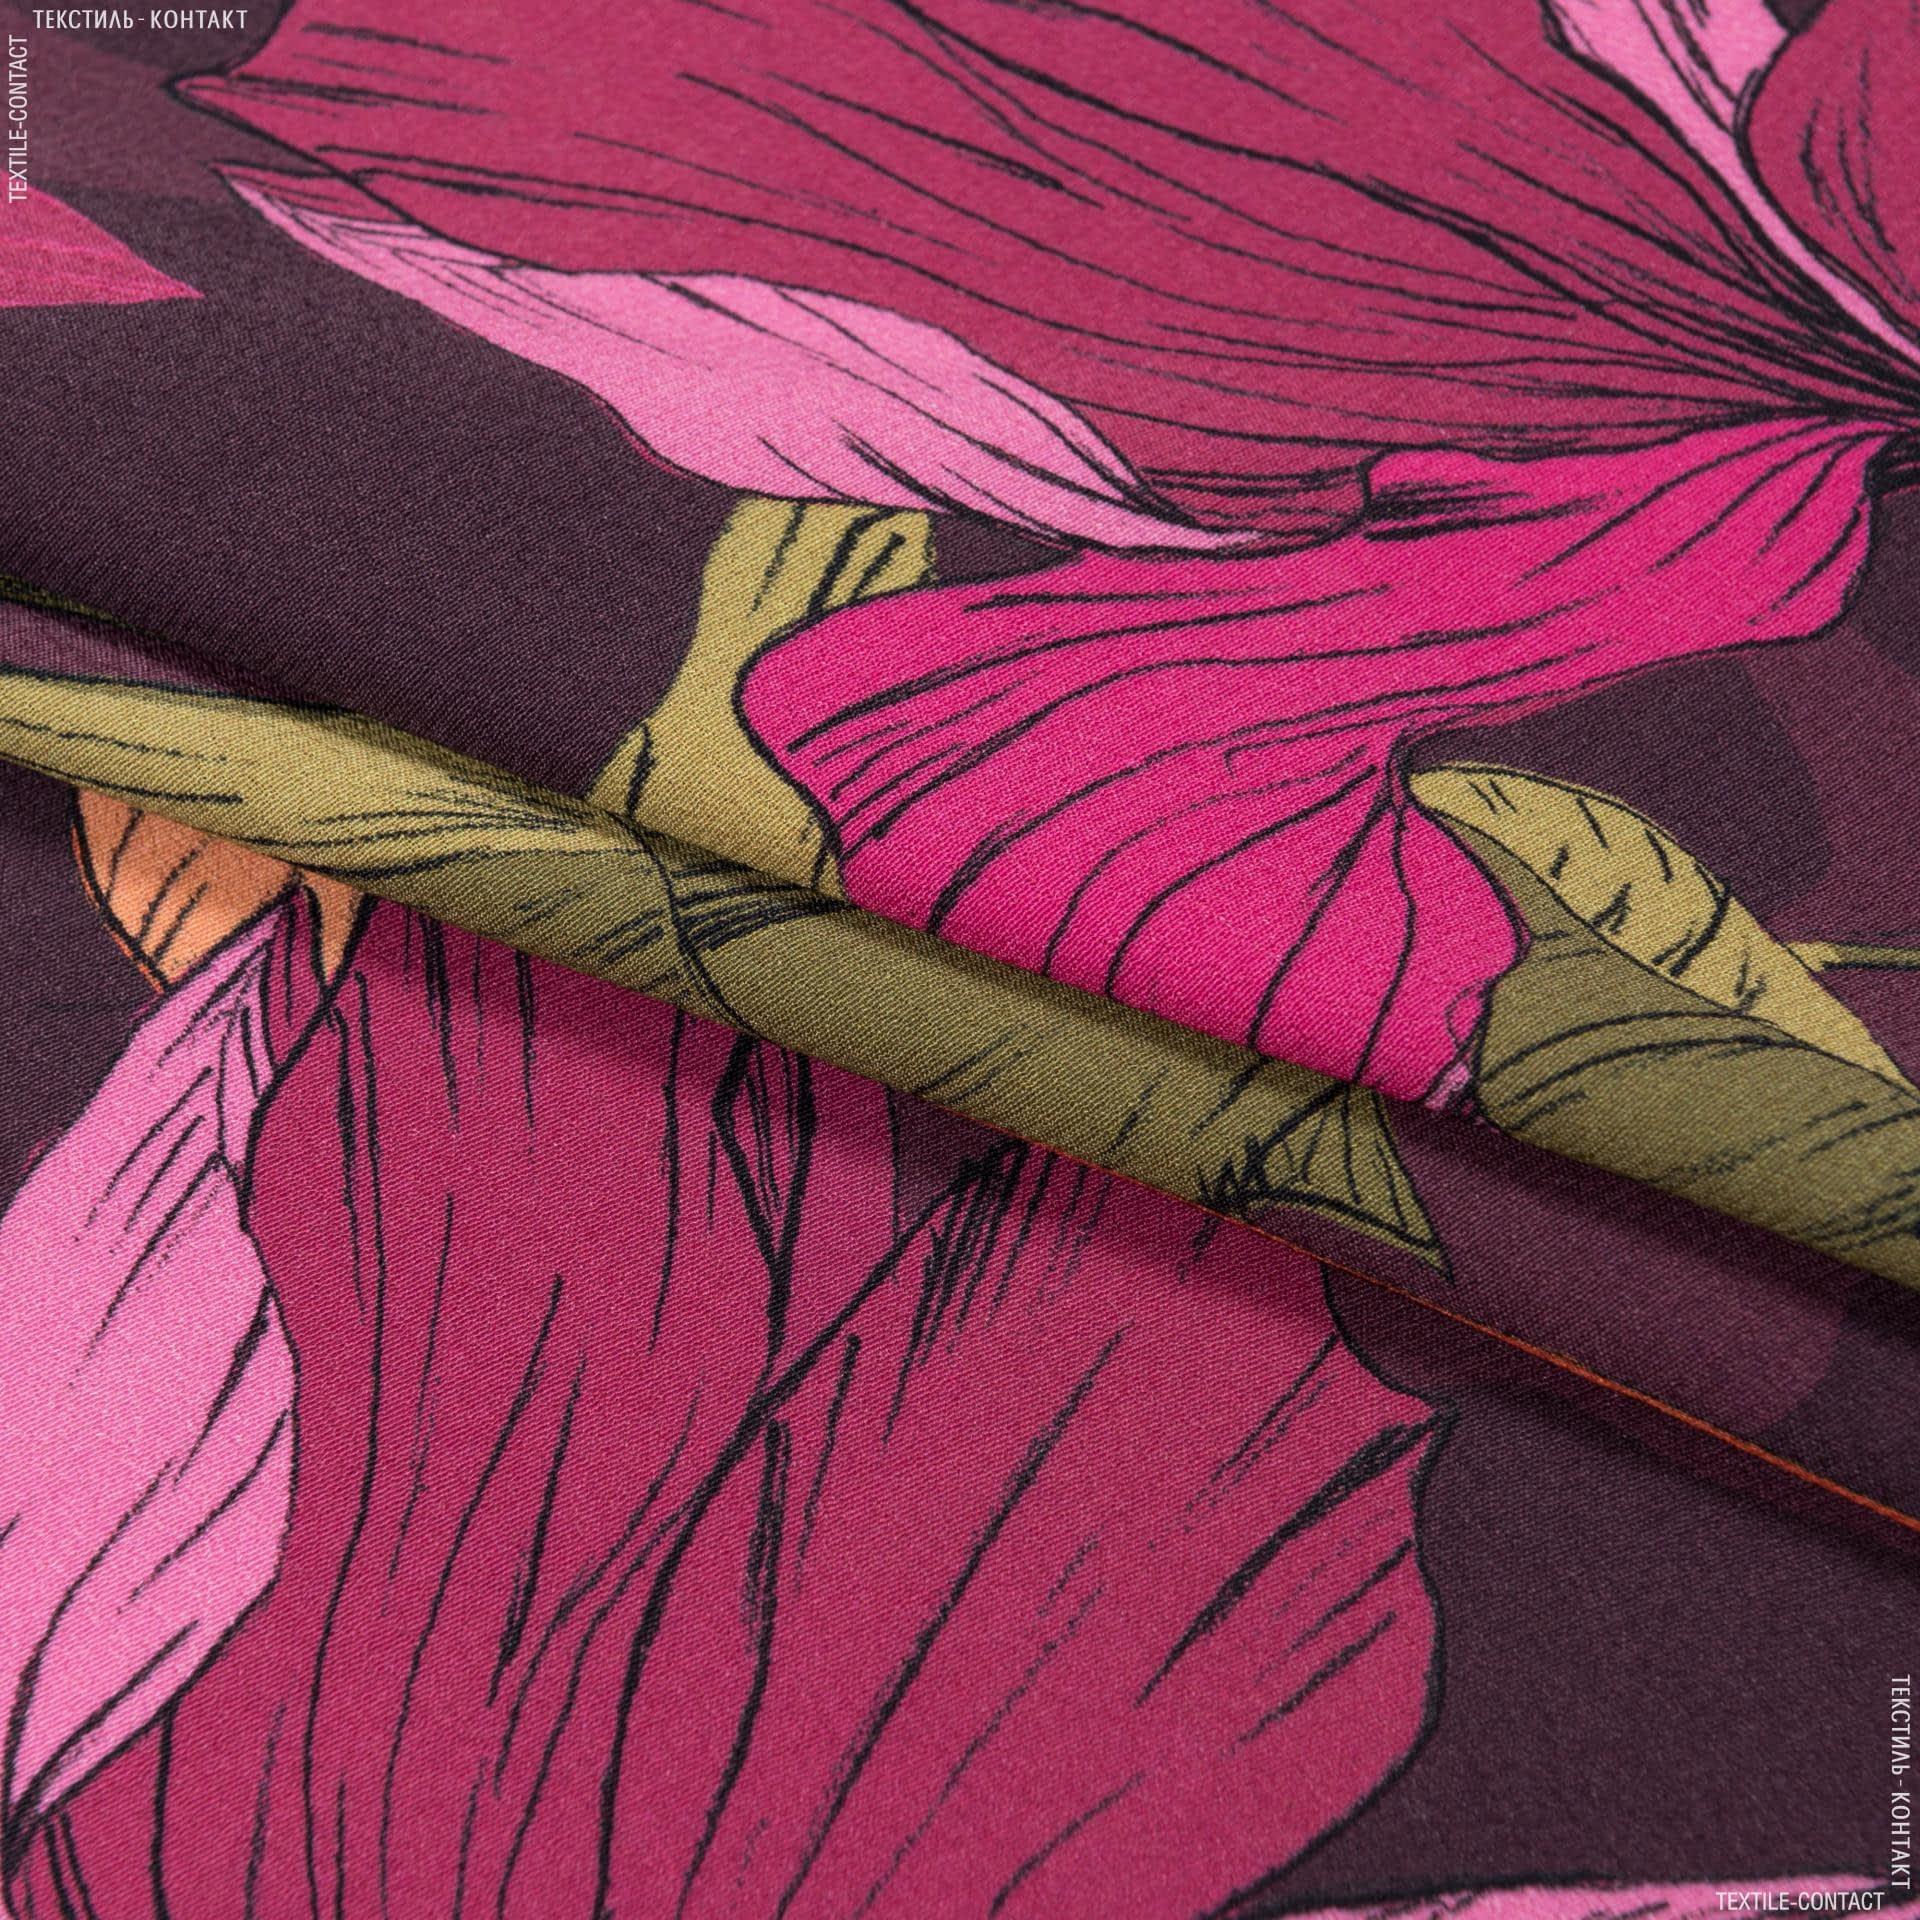 Тканини для хусток та бандан - Платтяний жоржет принт